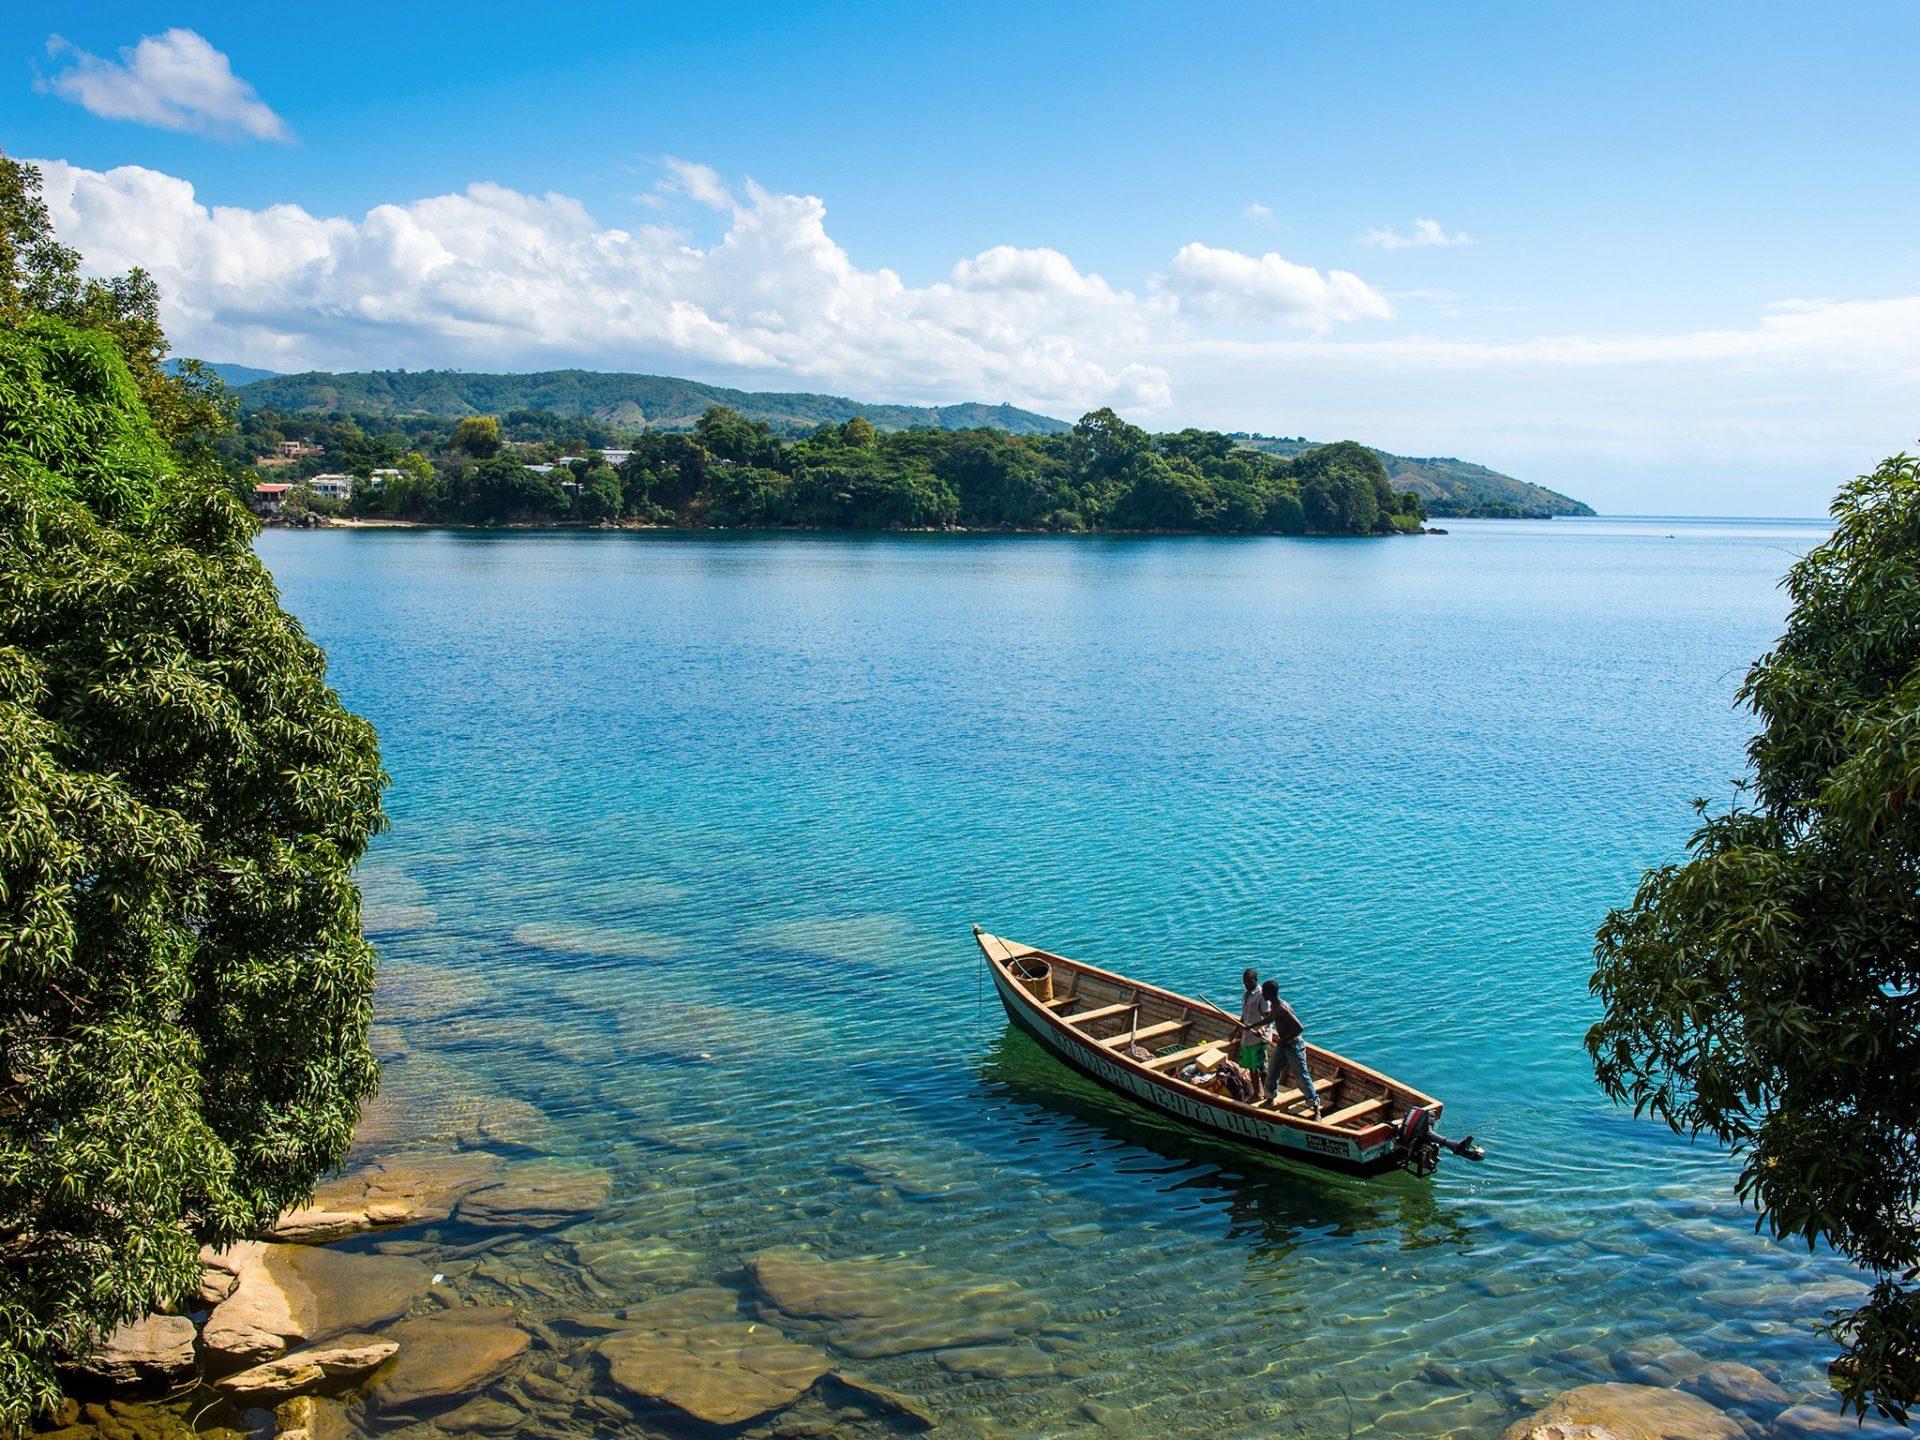 4. Озеро Малави, Малави, Мозамбик и Танзания.